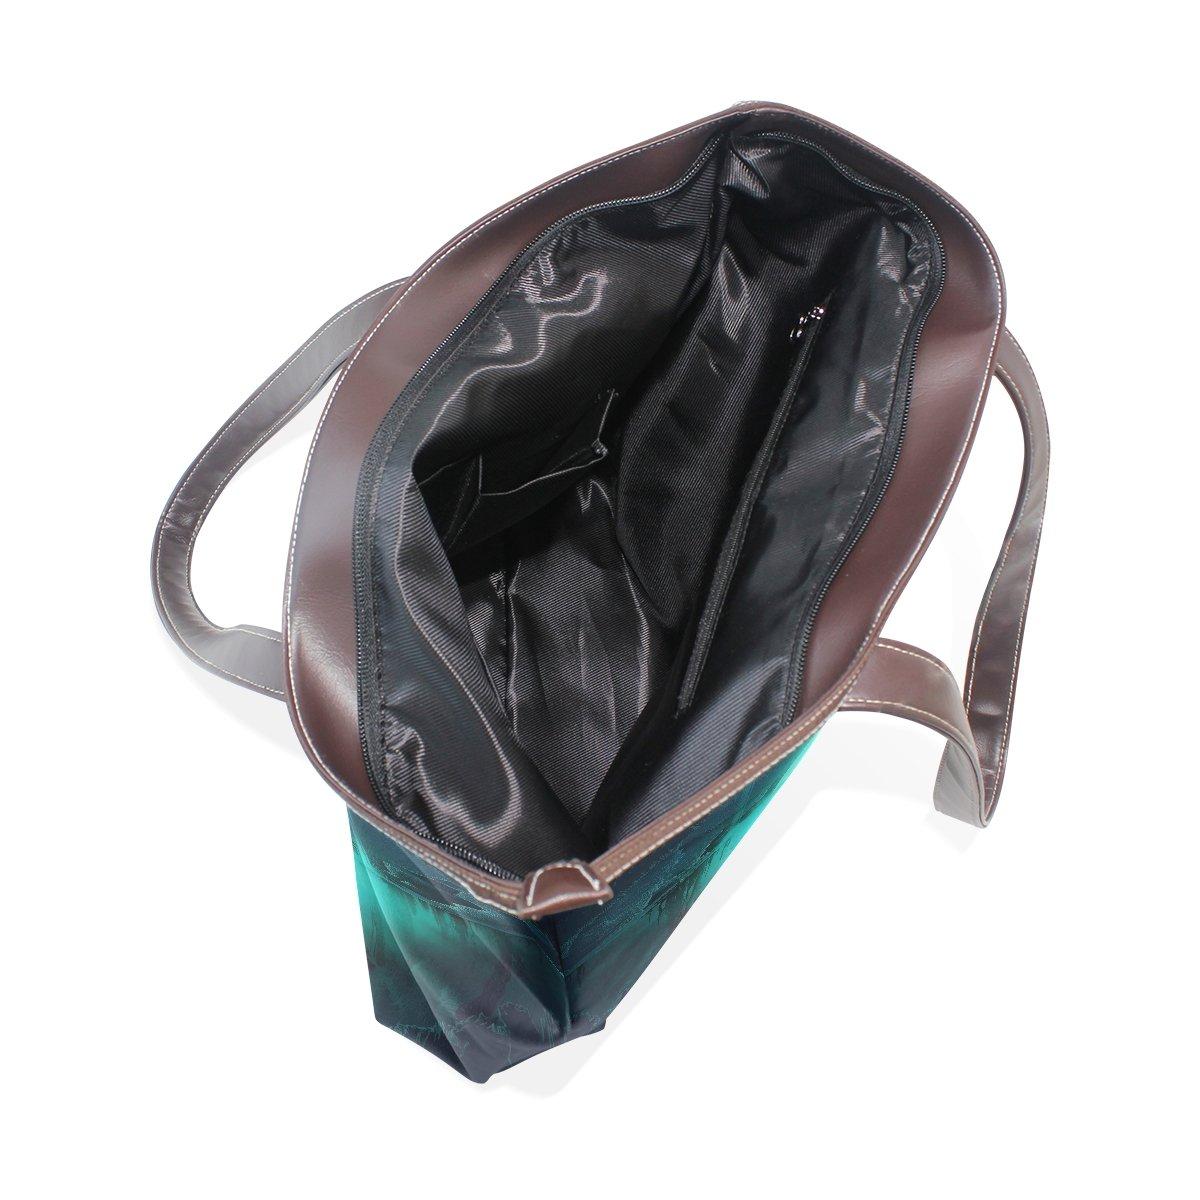 Mr.Weng Household Moonlight Quiet Good Lady Handbag Tote Bag Zipper Shoulder Bag